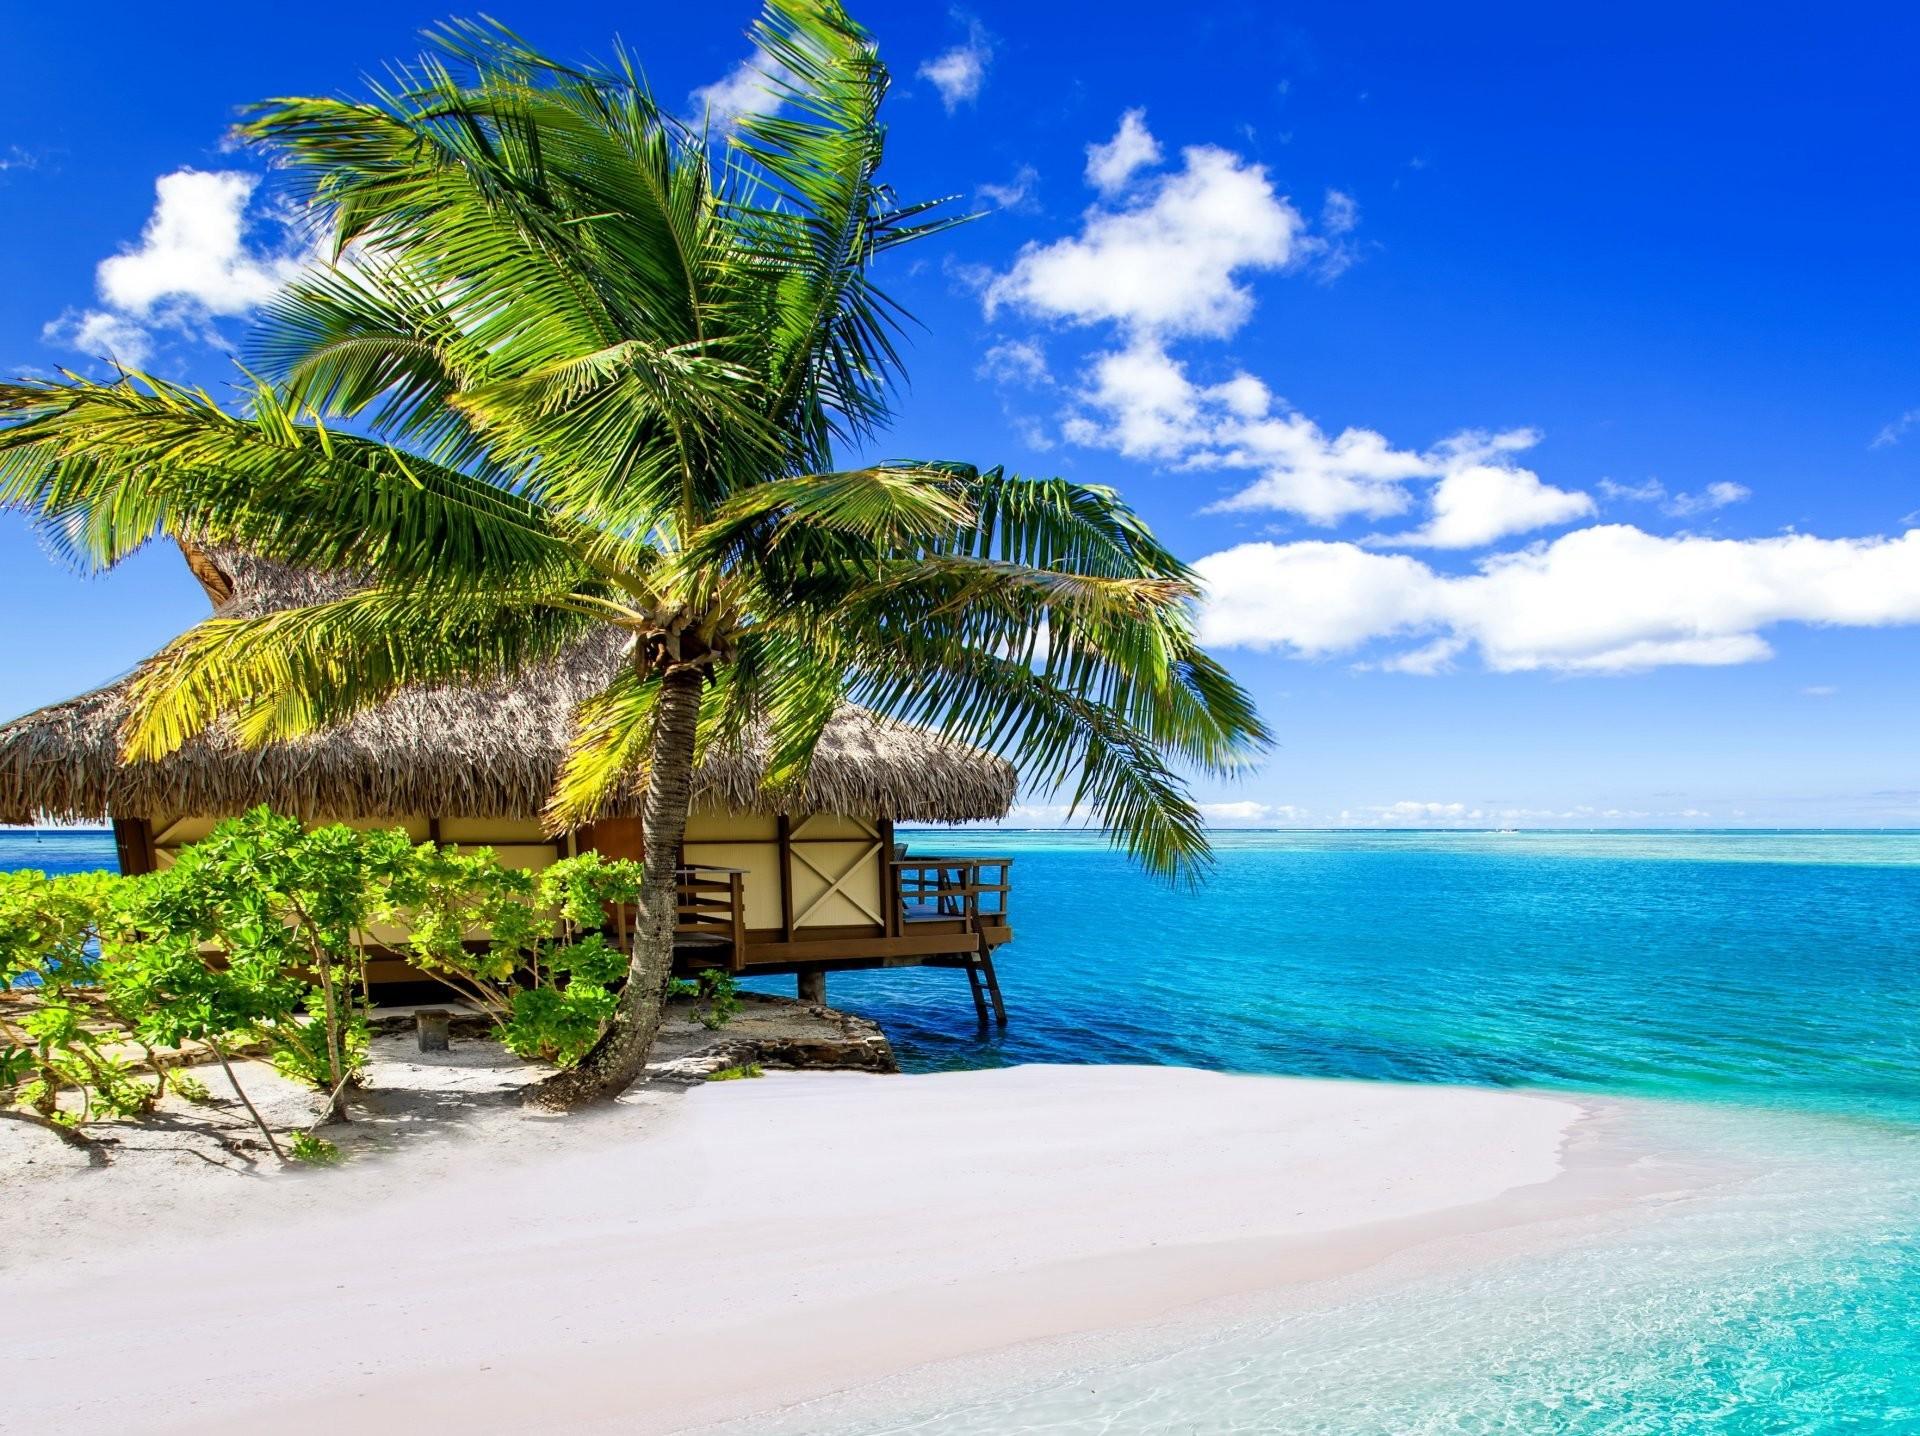 Hd Tropical Island Beach Paradise Wallpapers And Backgrounds: Paradise Beach Wallpaper ·① WallpaperTag